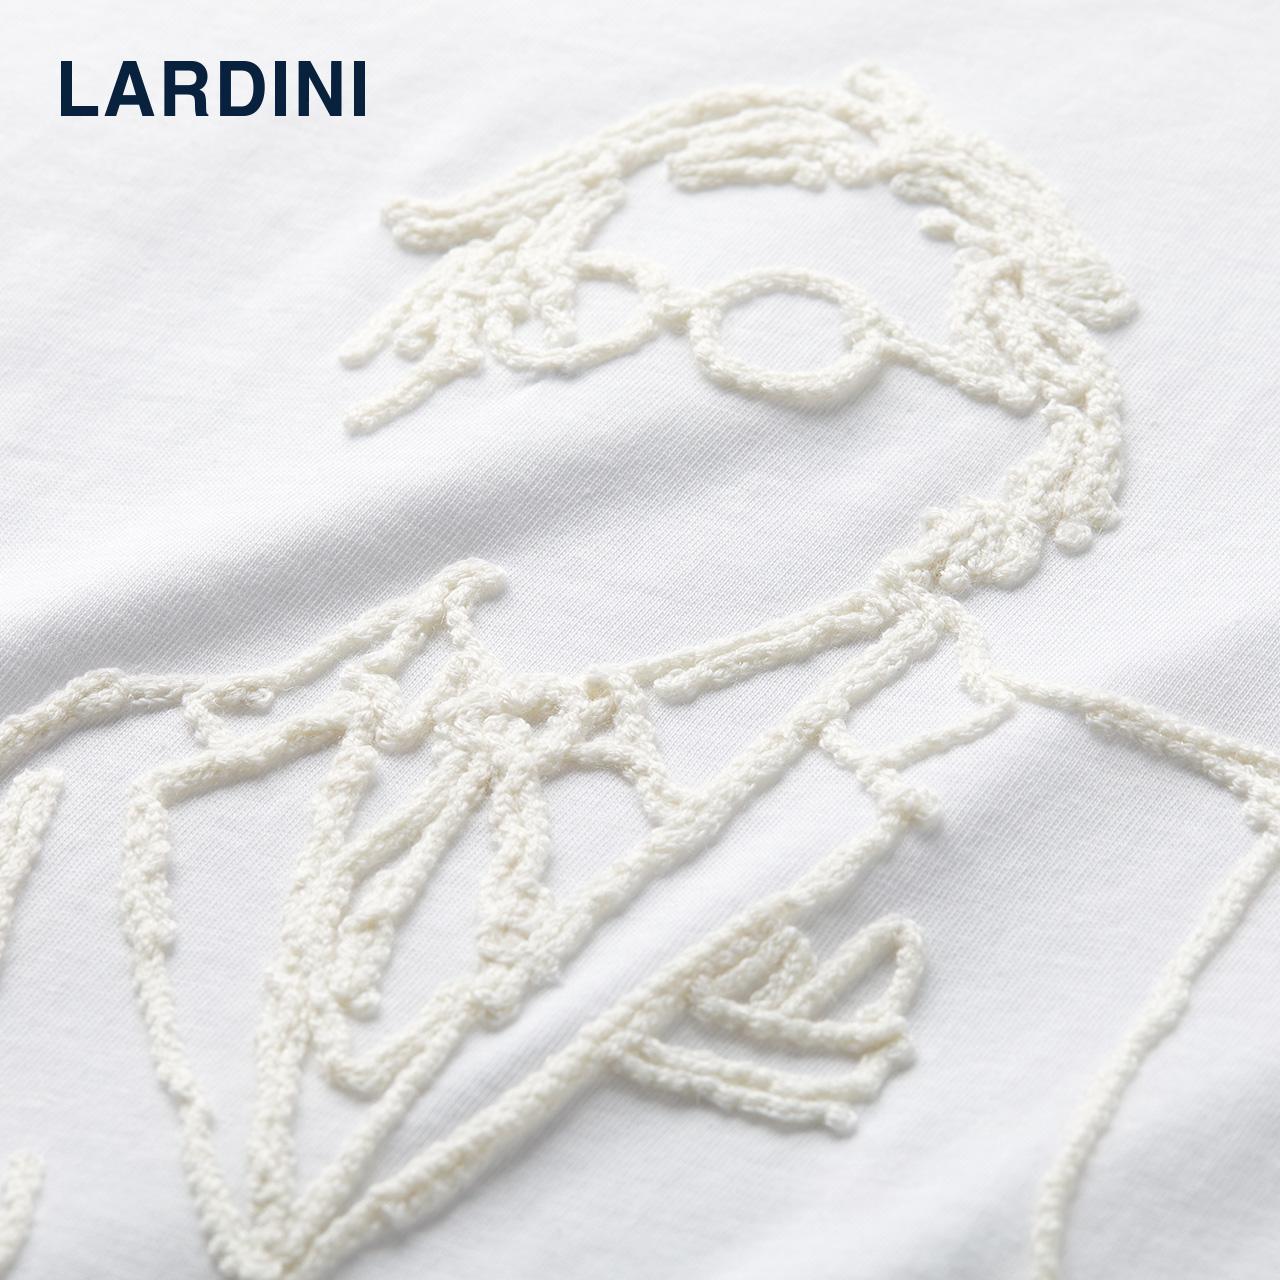 LARDINI 意大利进口 设计师系列人物图案 T恤